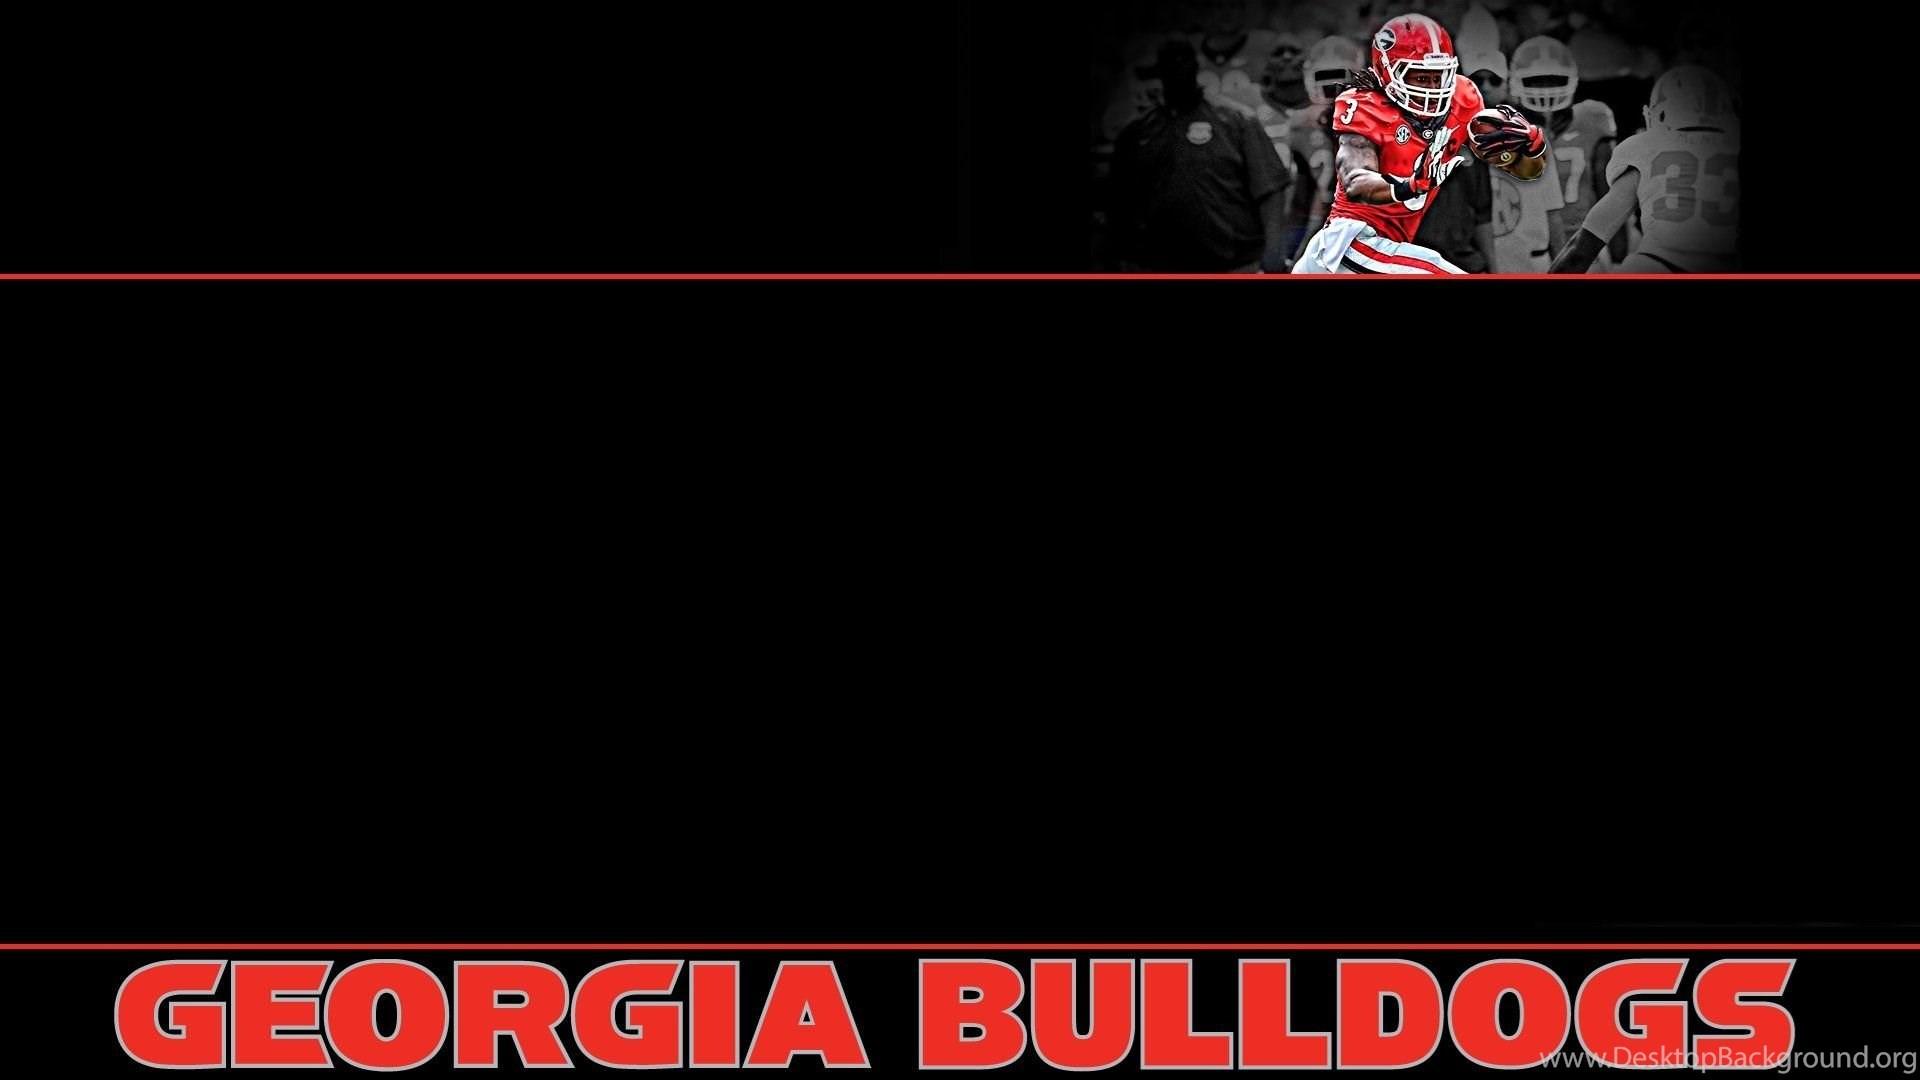 georgia bulldogs wallpapers  48 images ncaa basketball logo 2018 ncaa baseball logos